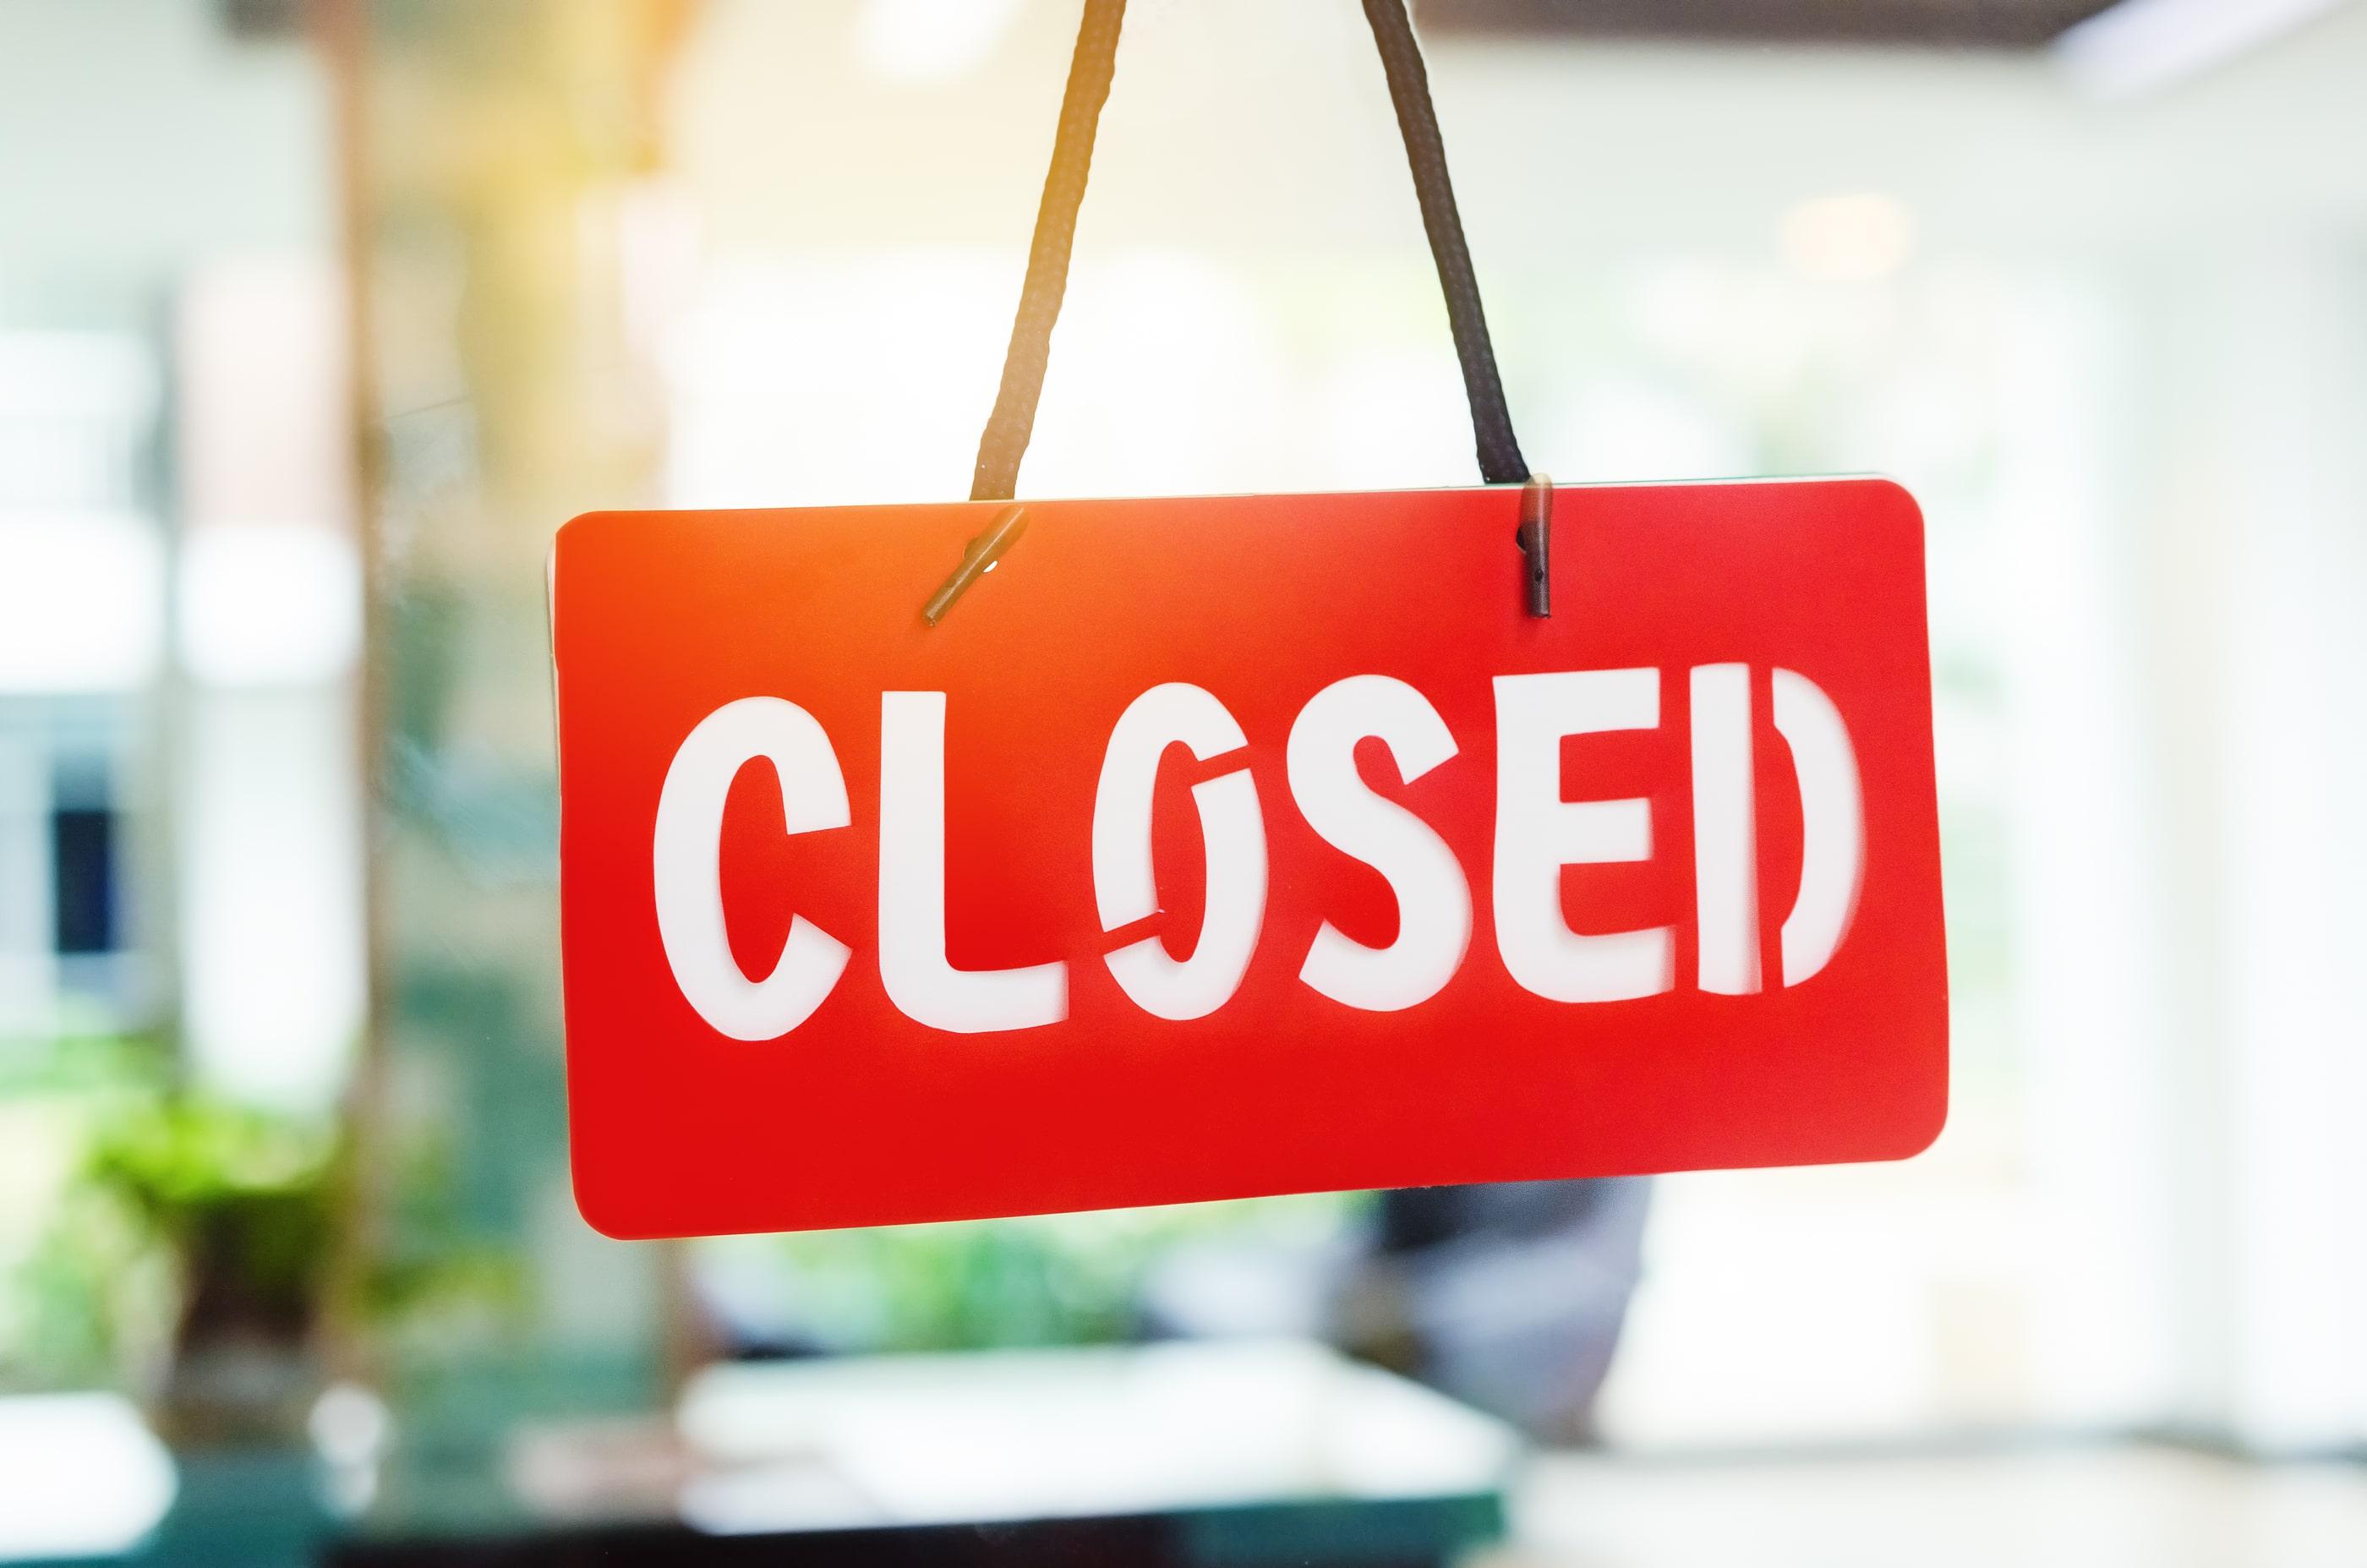 oficina cerrada